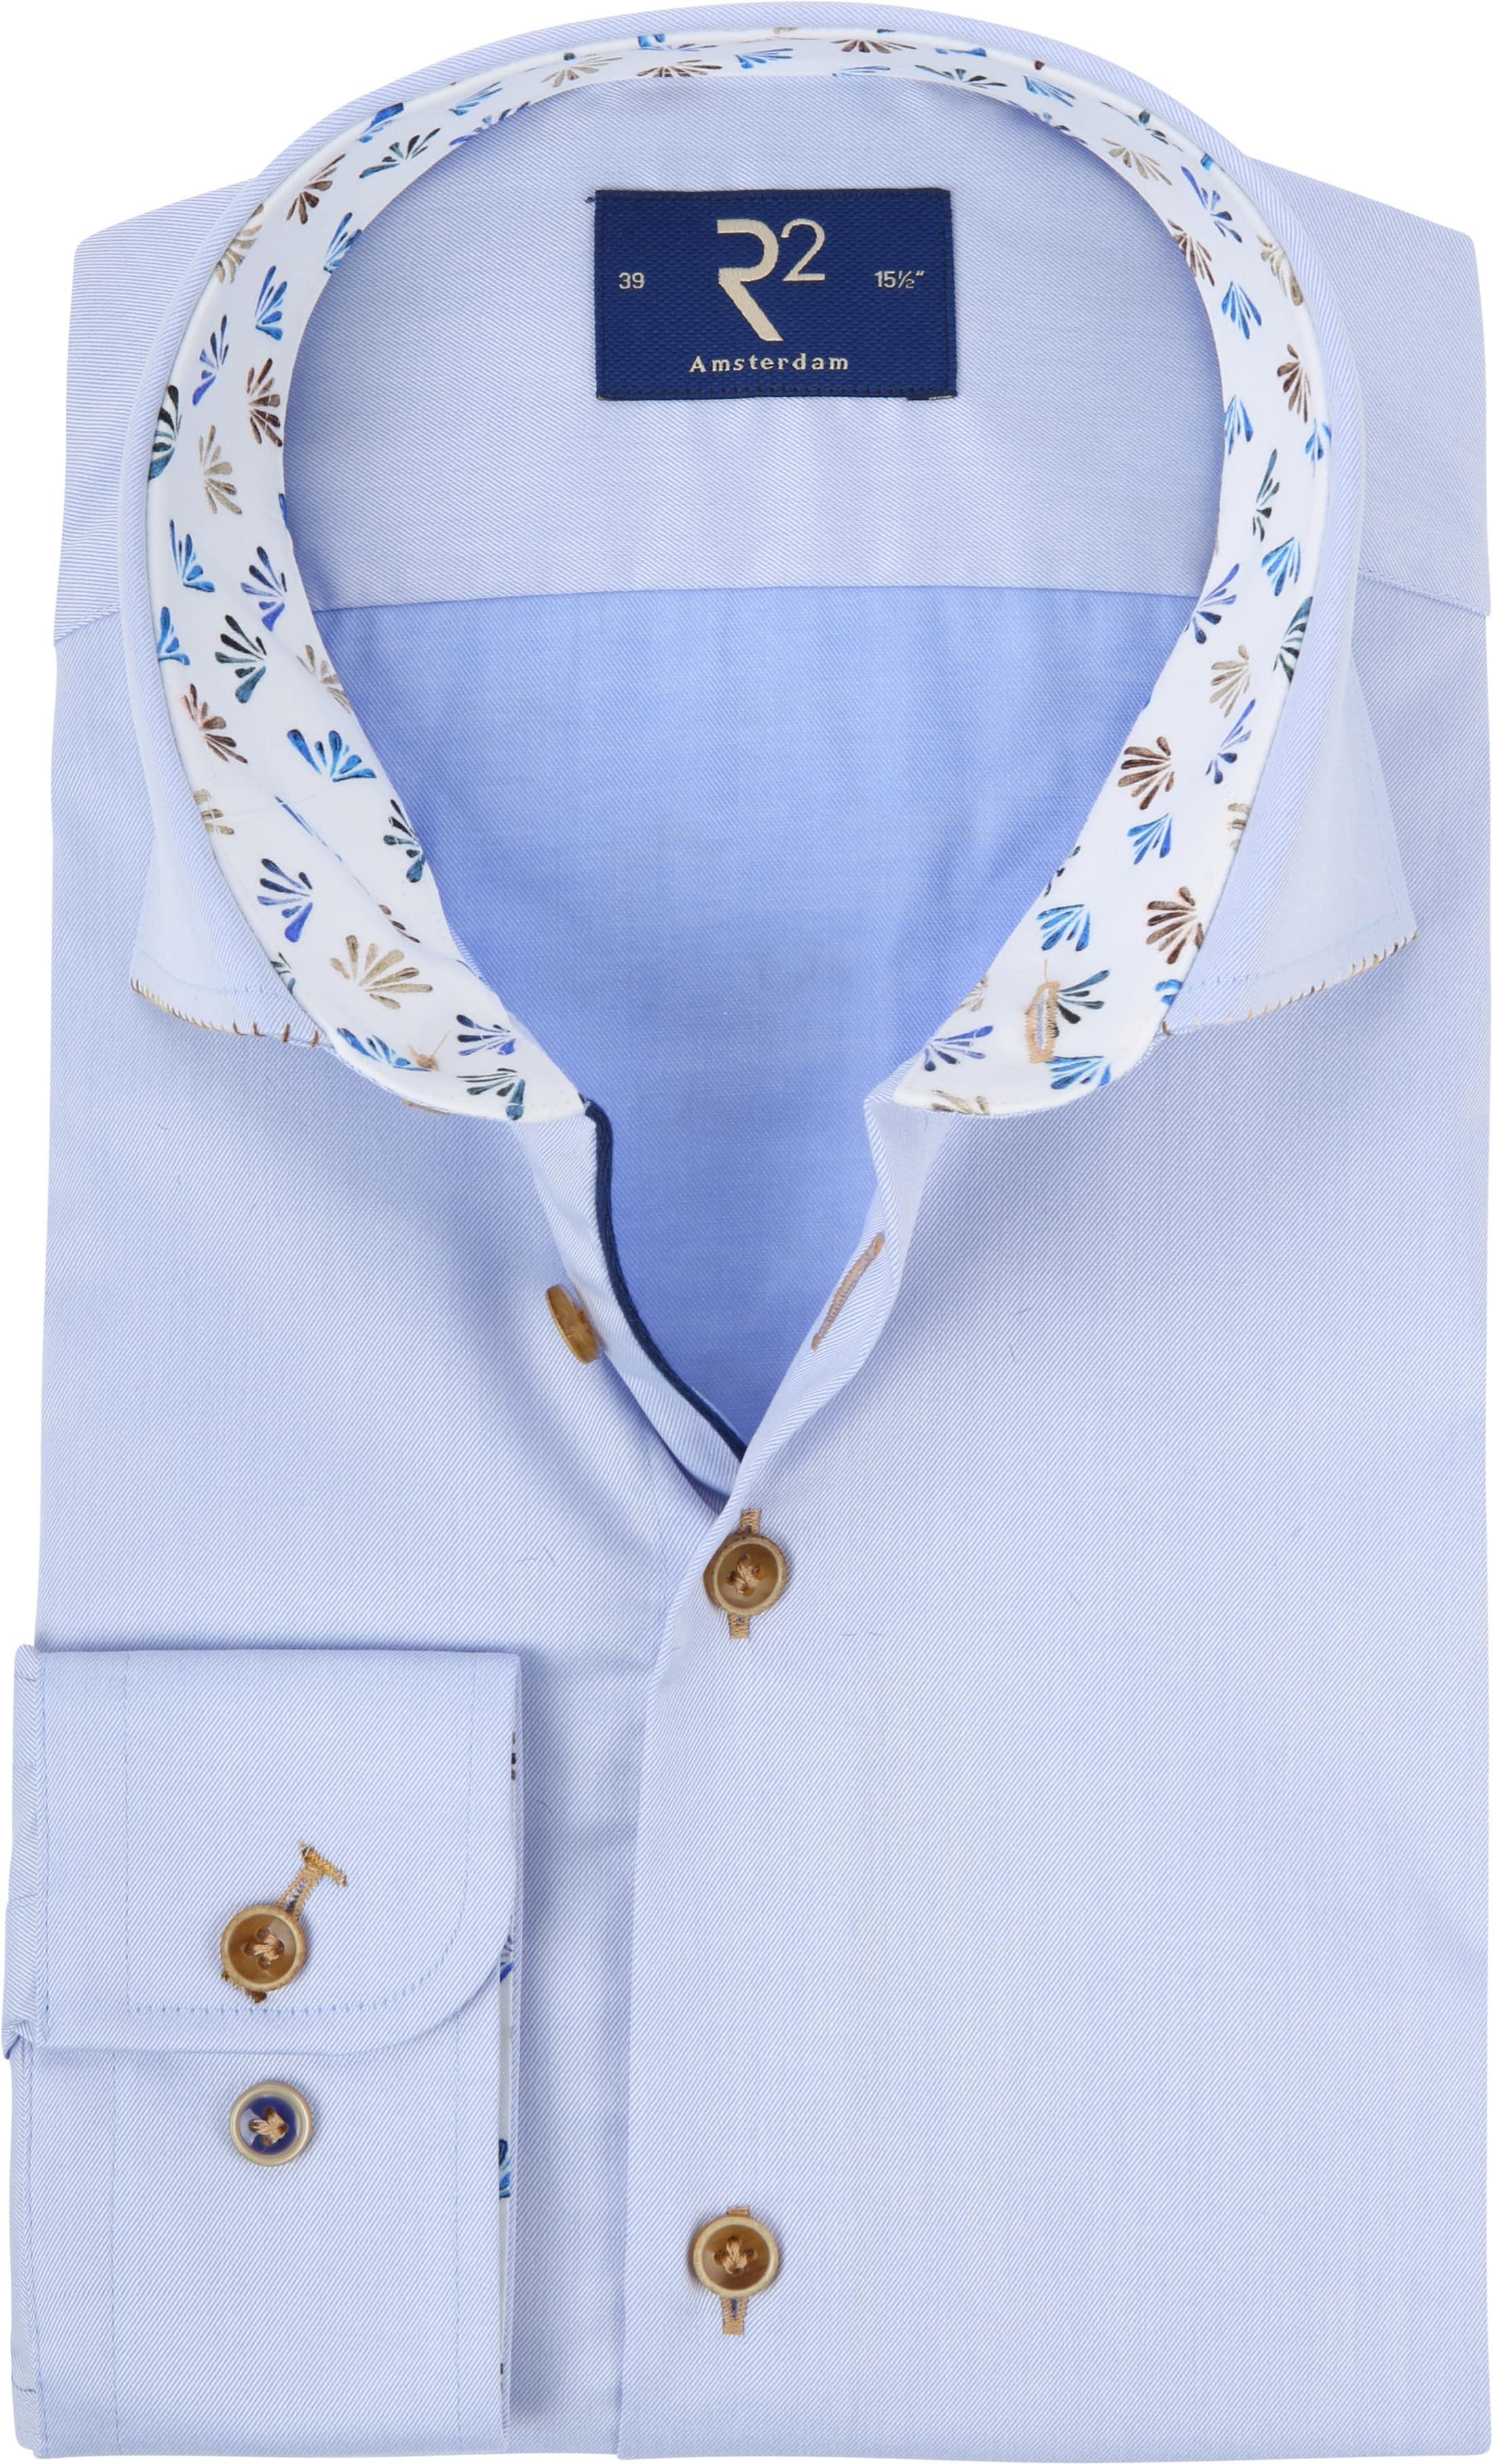 R2 Overhemd Blauw Fijne Twill foto 0